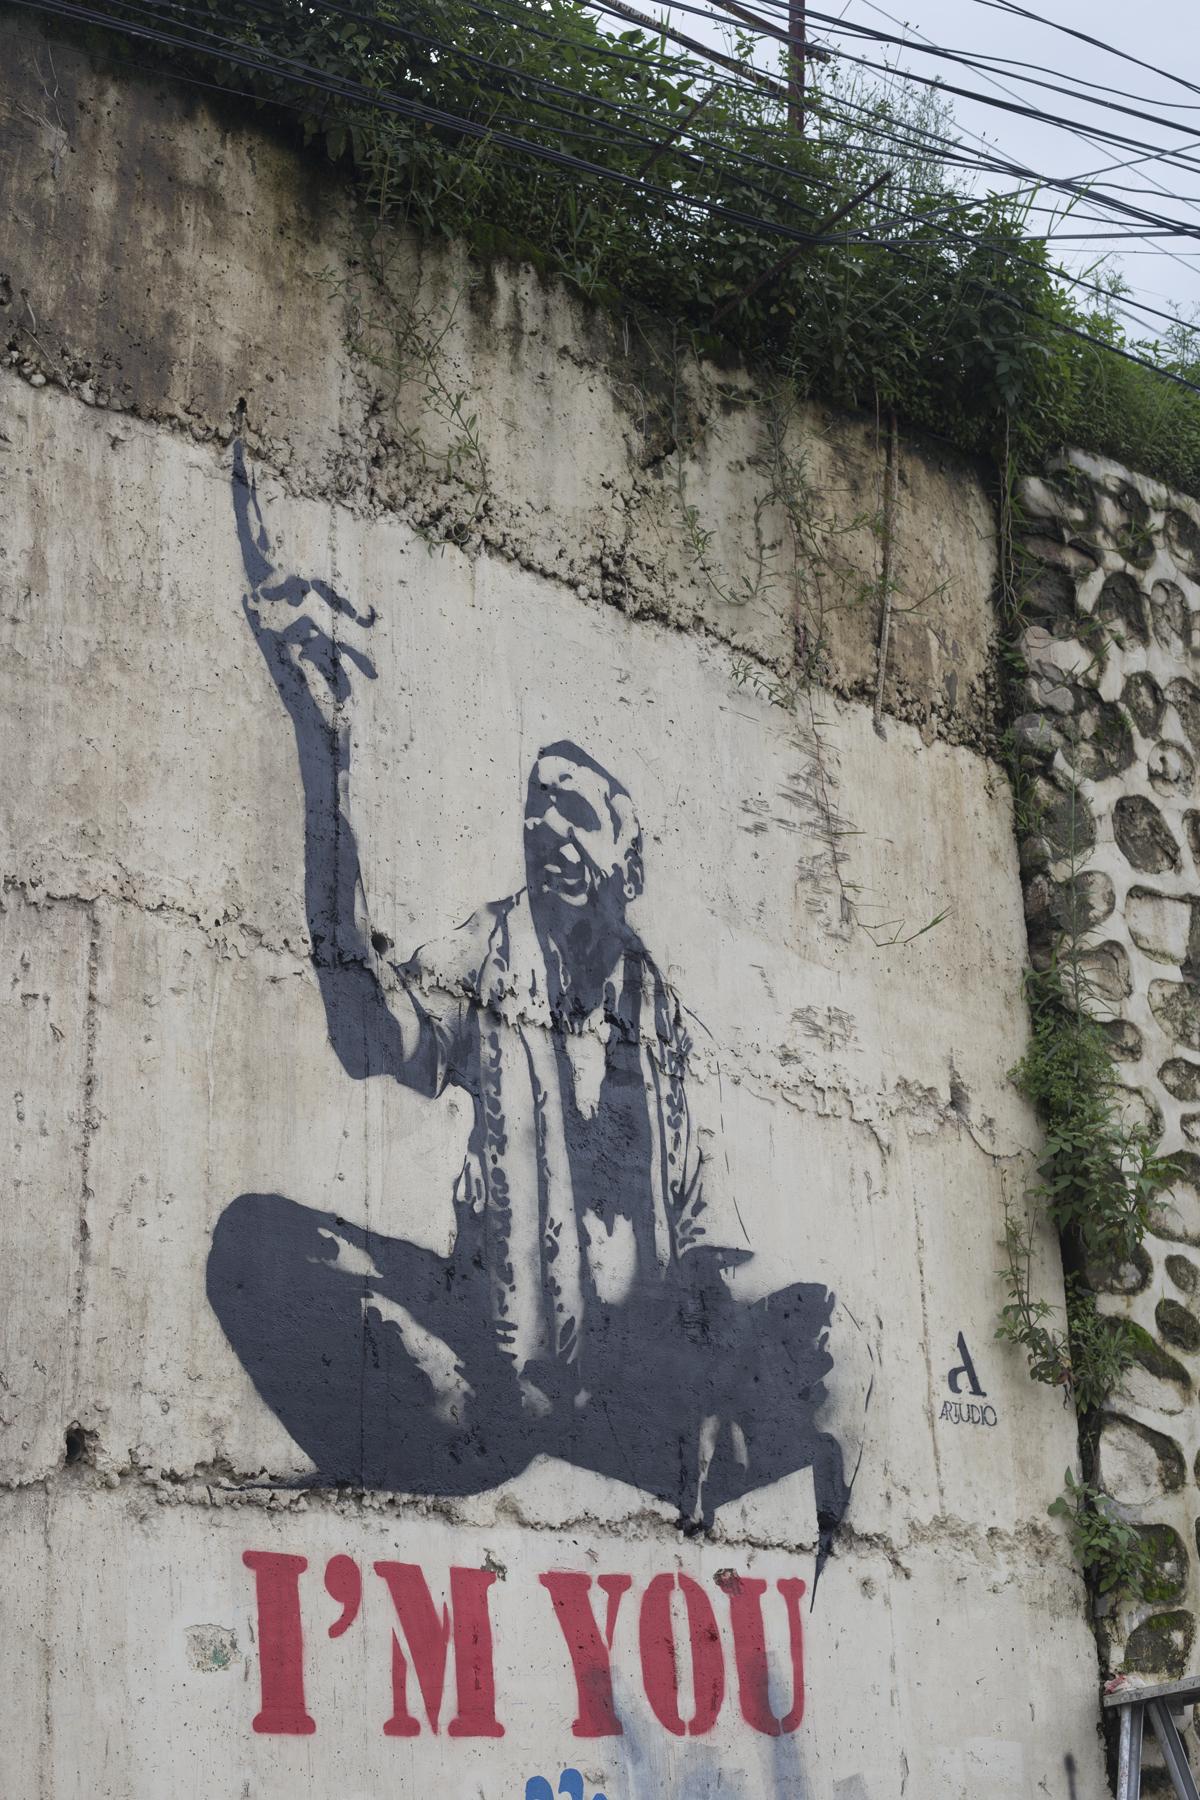 Artudio_I'M YOU_Street Art-Babarmahal (7)